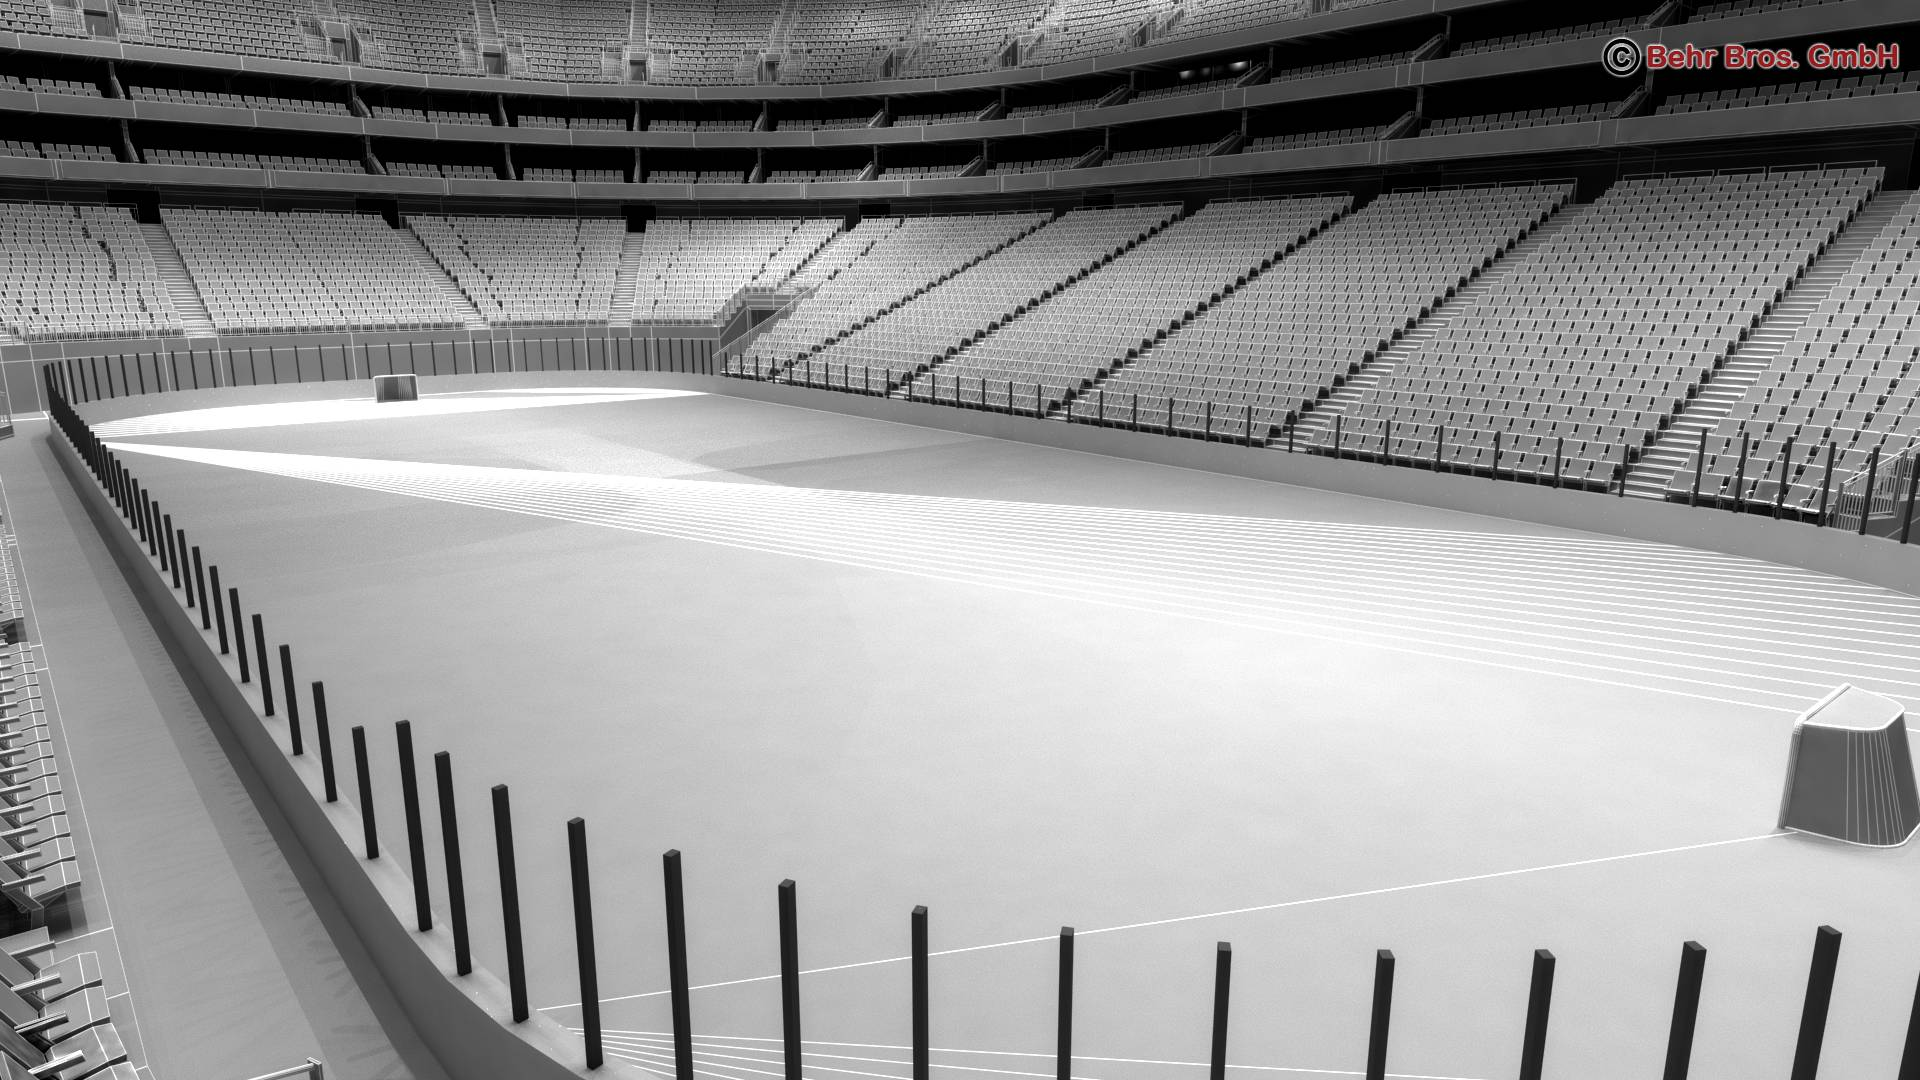 ice hockey arena v2 3d model 3ds max fbx c4d lwo ma mb obj 251662